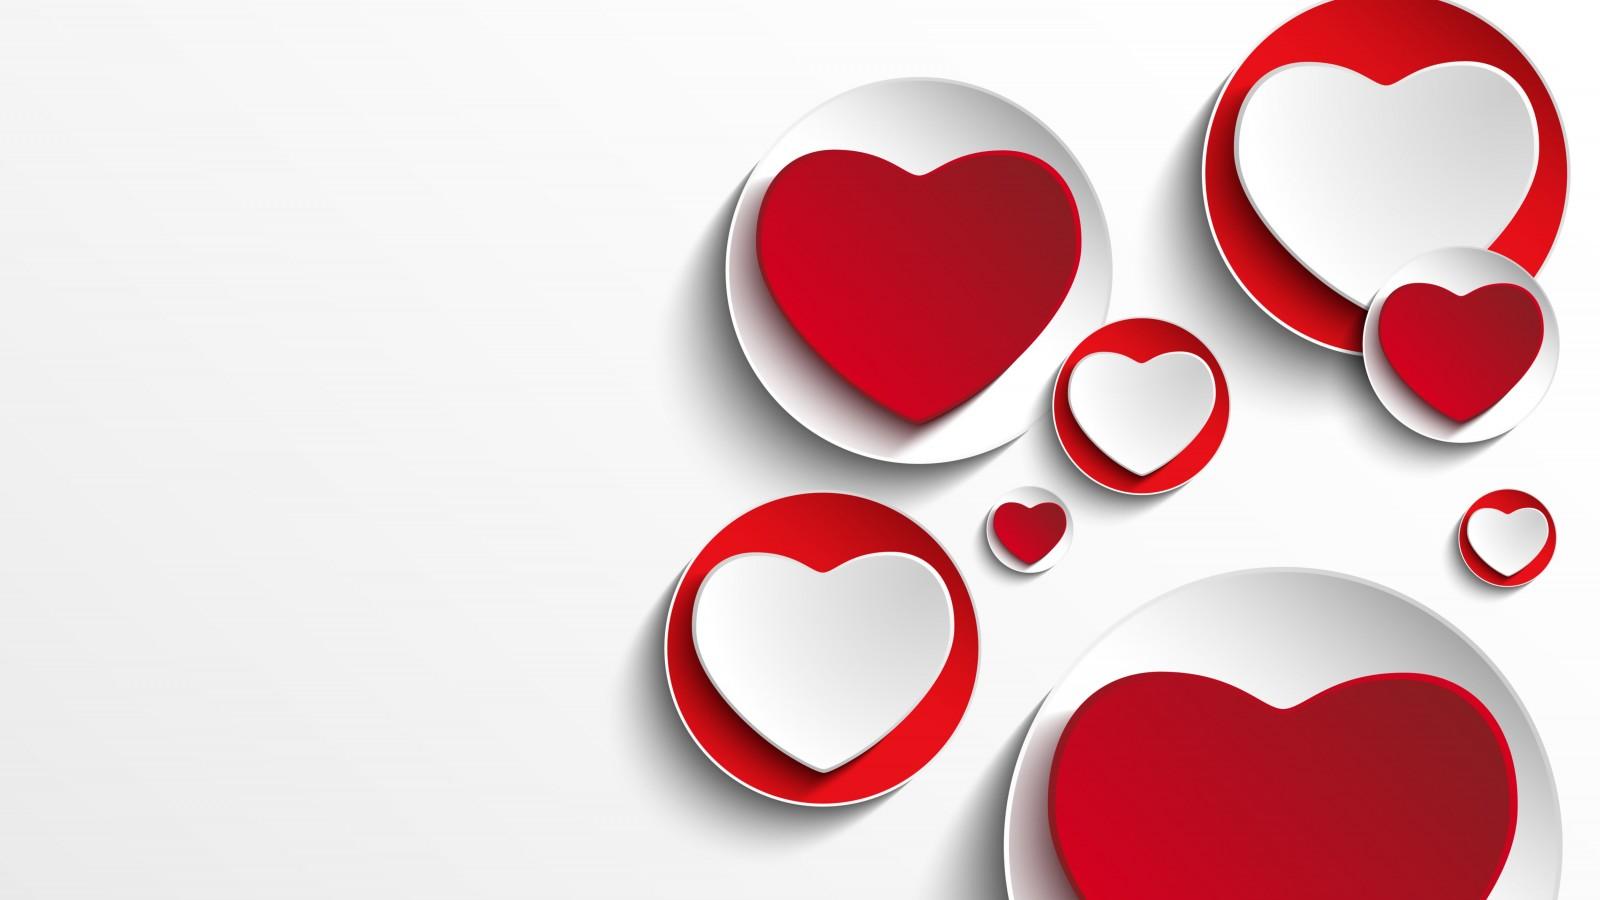 Minimalistic Hearts Shapes HD Wallpaper For 1600x900